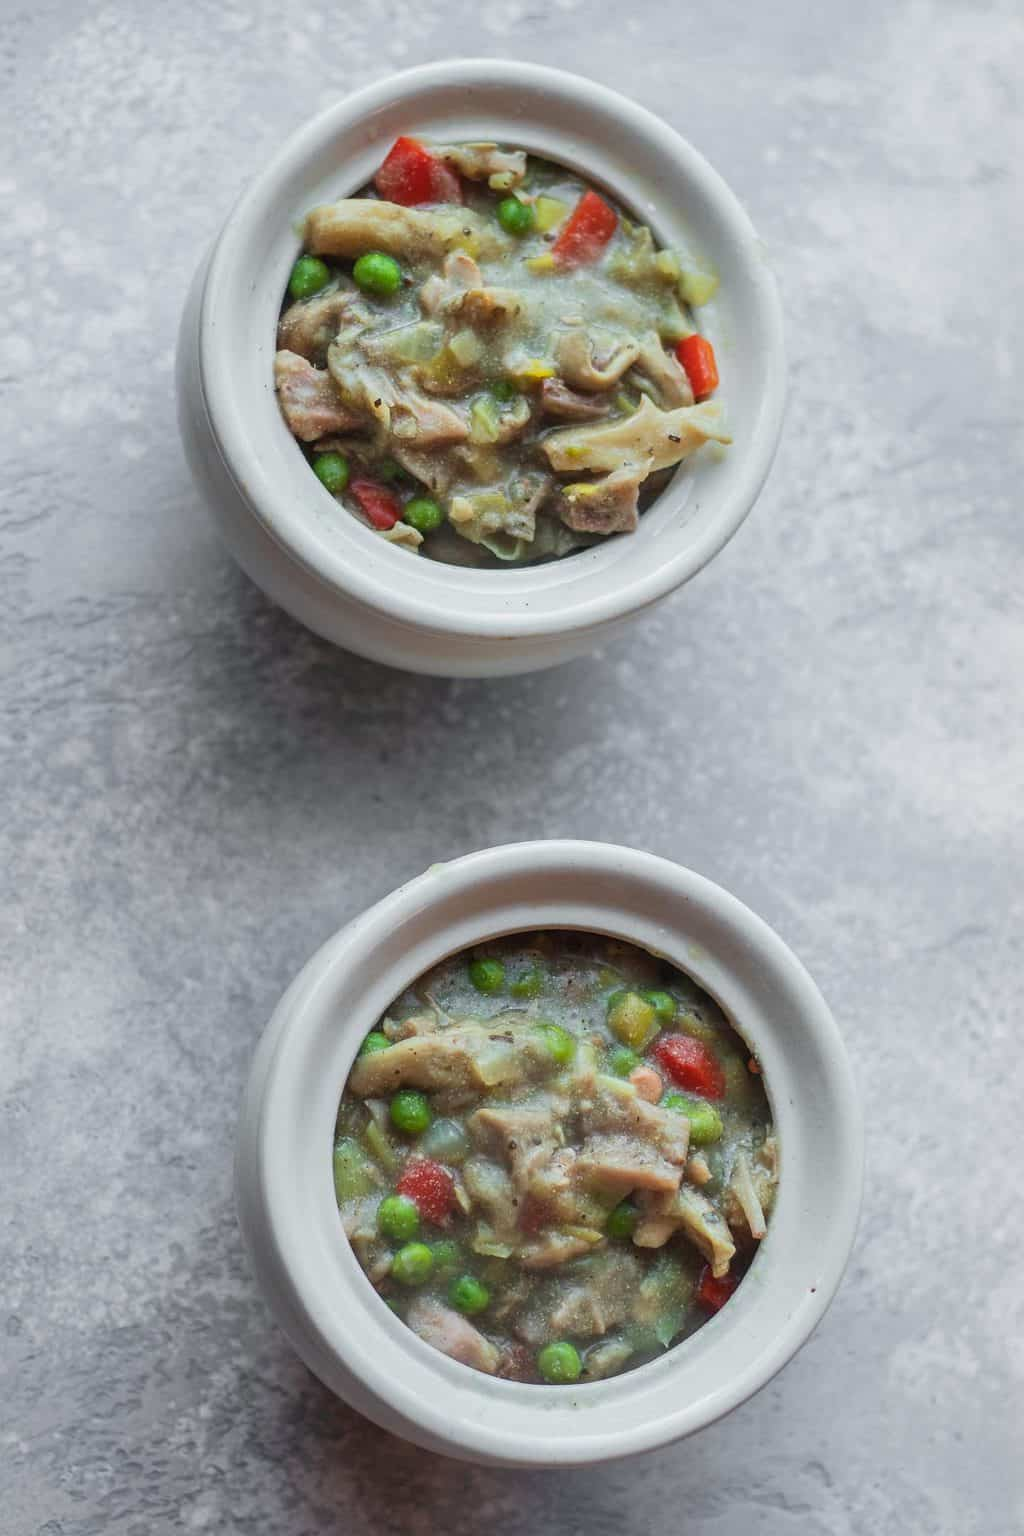 Vegan pot pies with jackfruit and vegetables